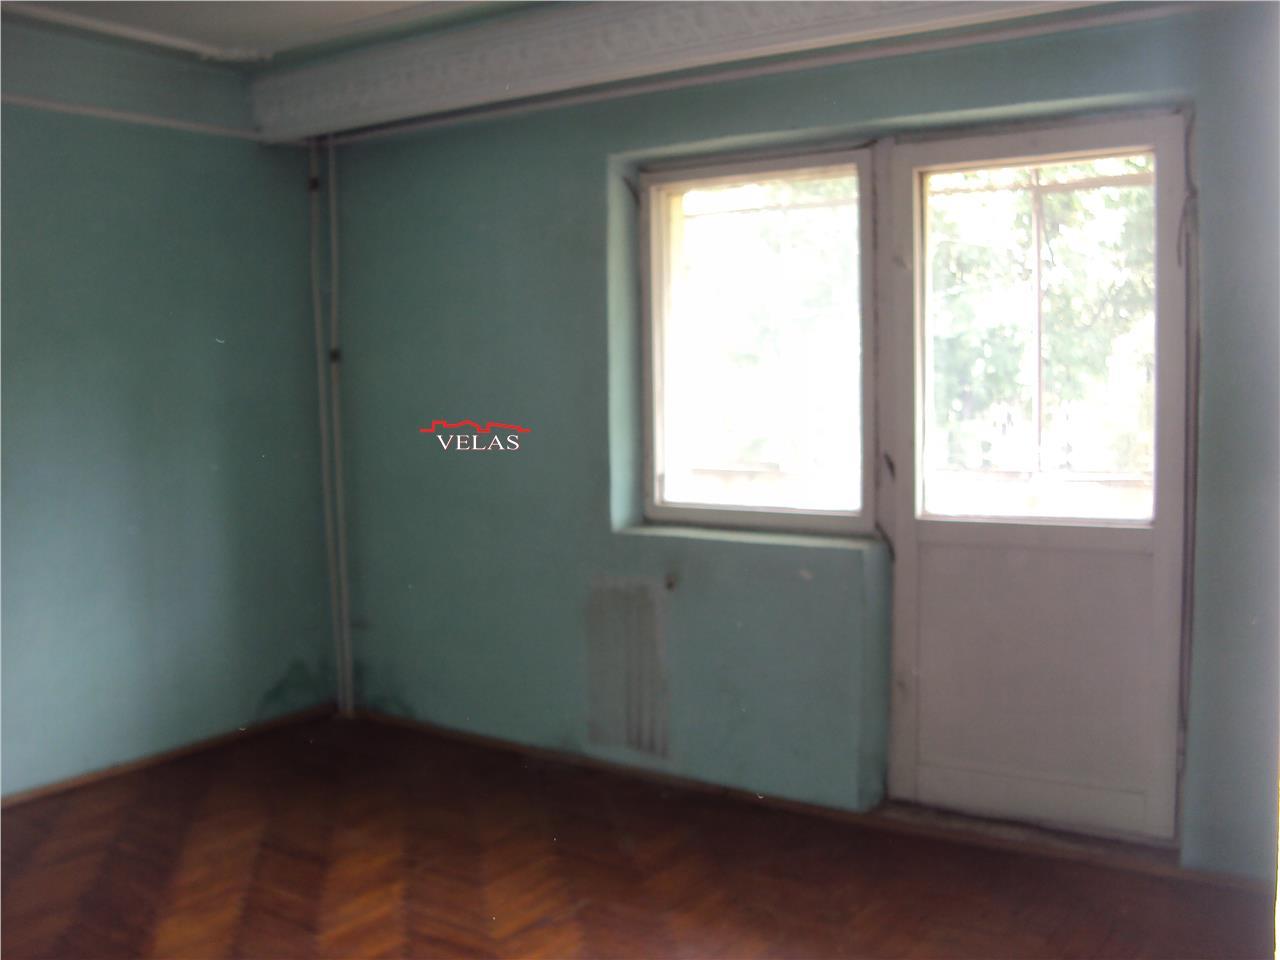 Apartament 3 camere, et 1, doua balcoane, doua bai, fosta Autogara